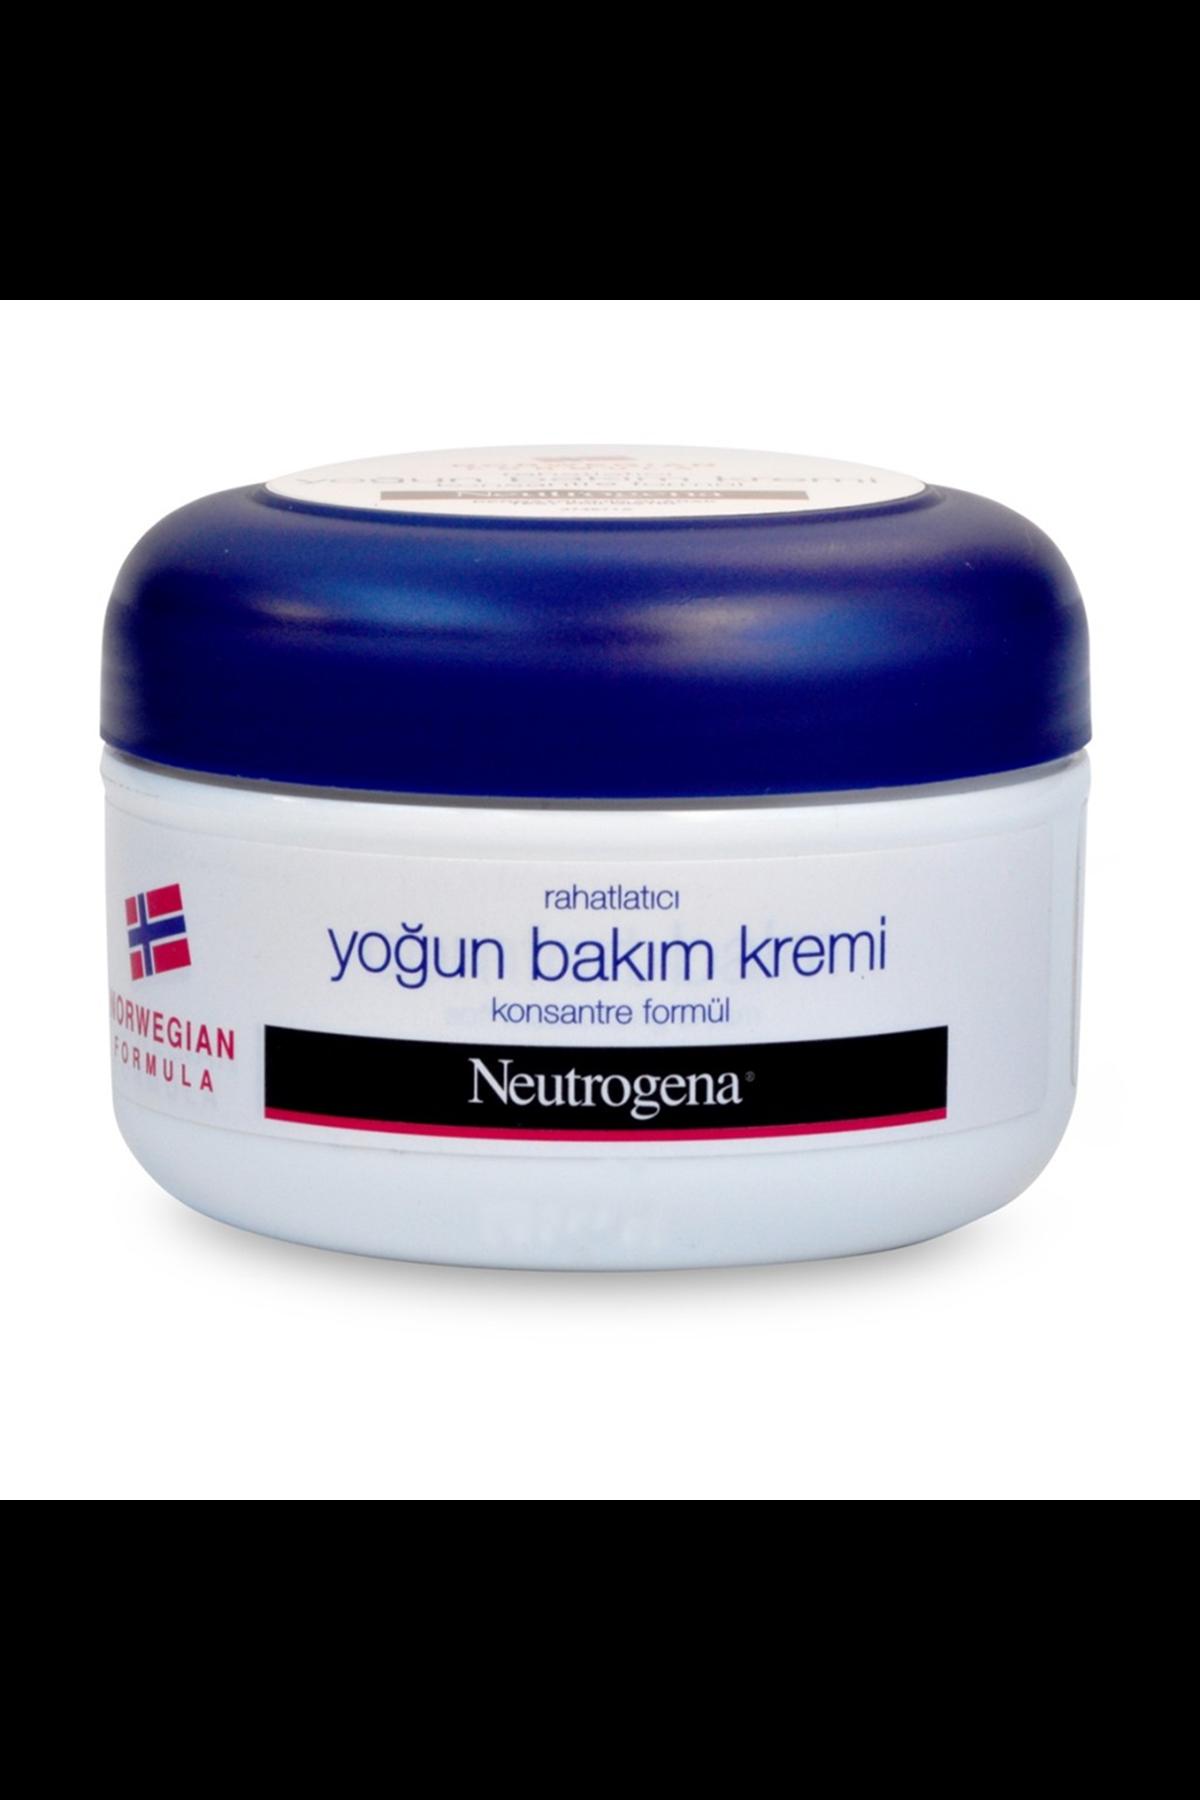 Neutrogena Yoğun Bakım Kremi 200 ml